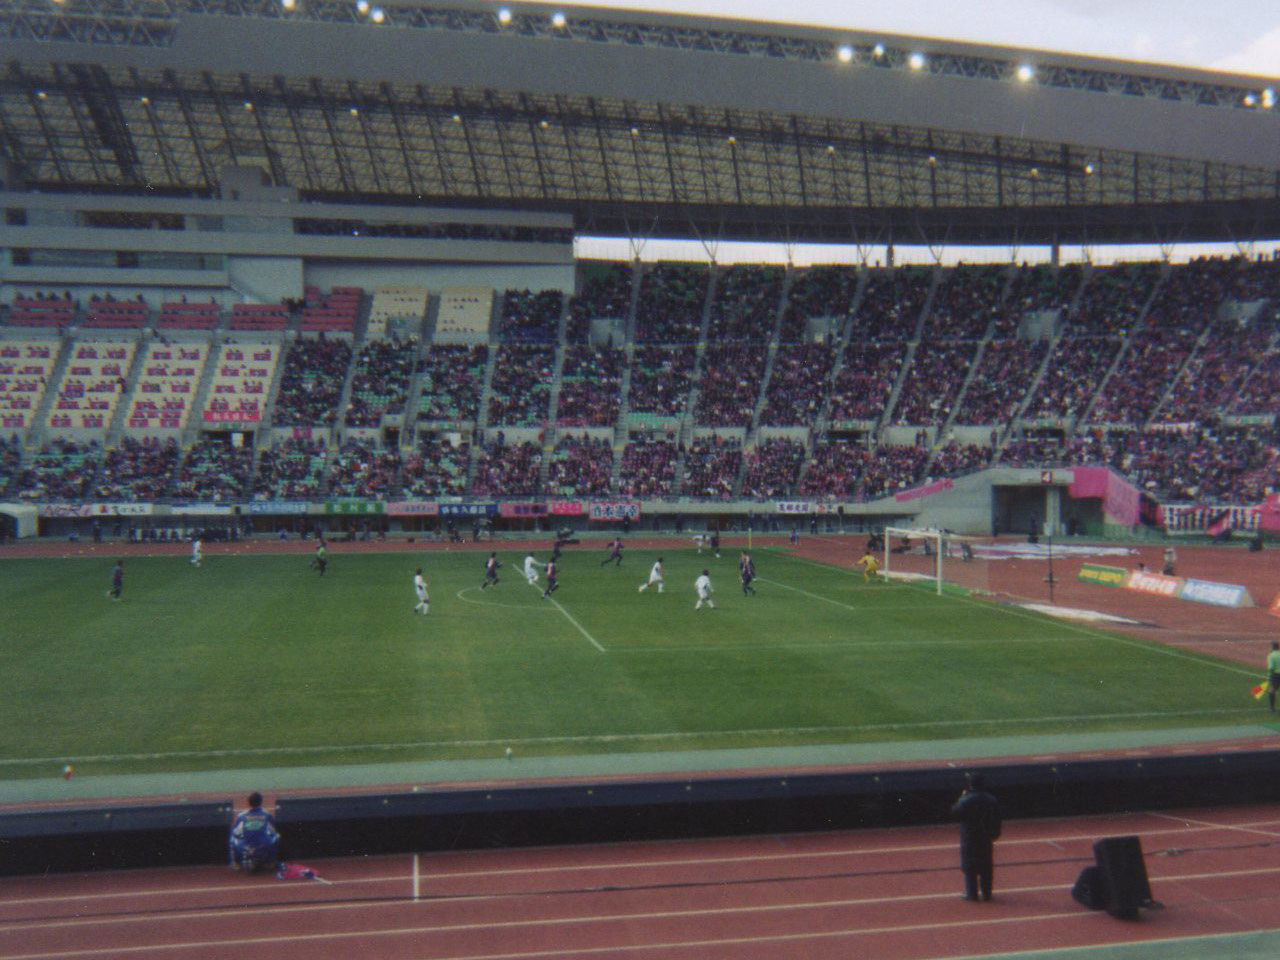 Bbs サッカー 千葉 県